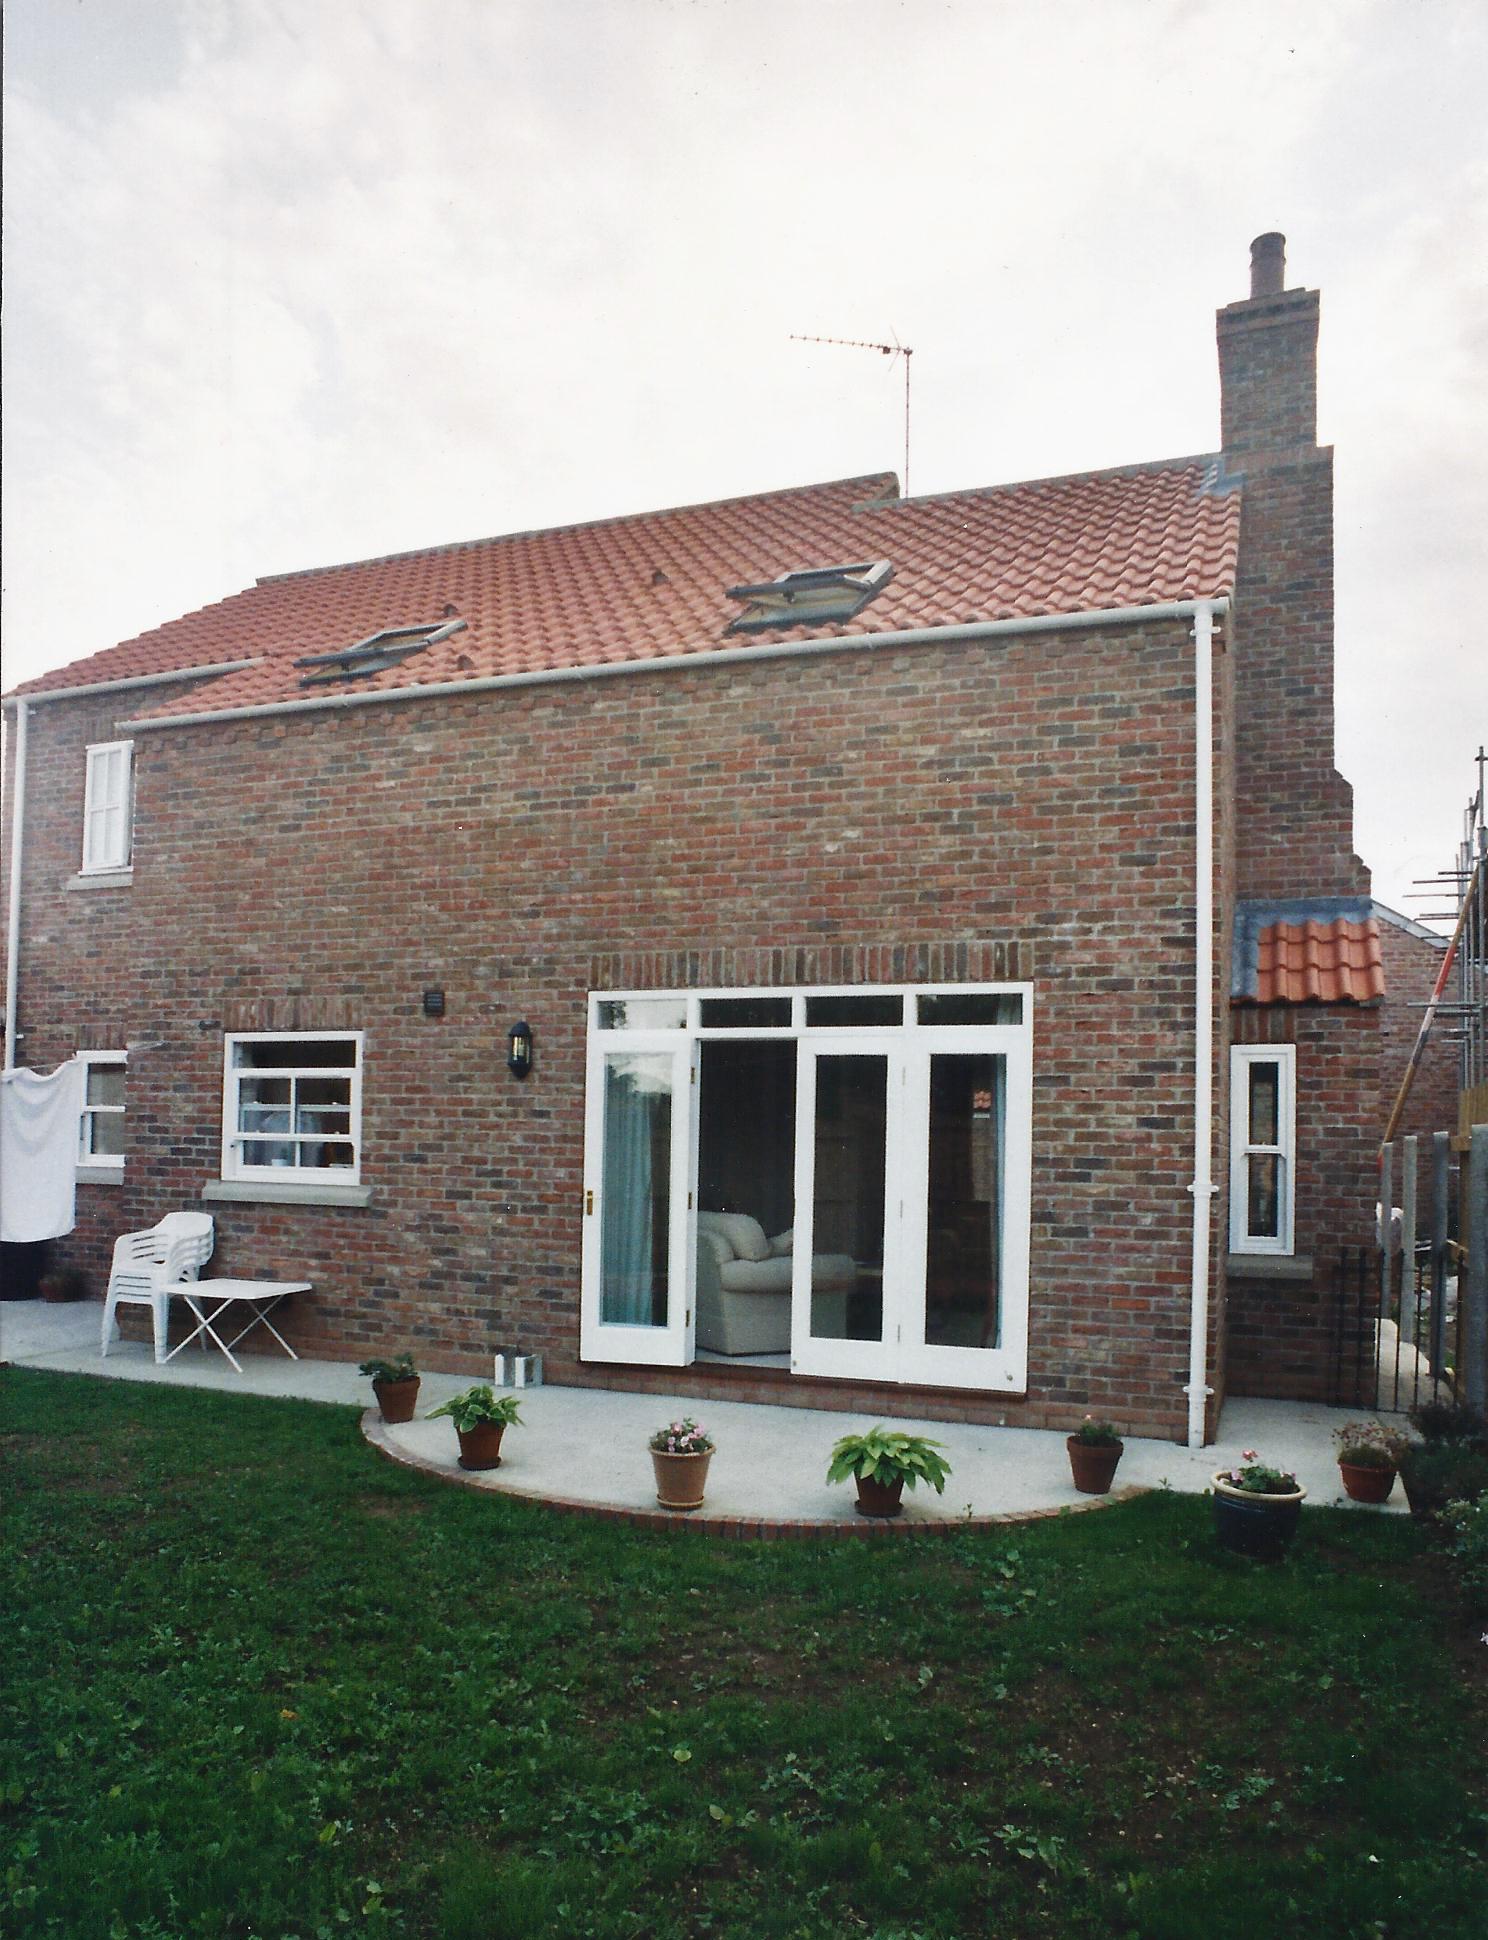 Blenheim Cottage 4 - East Yorkshire Architects - Samuel Kendall Associates.jpg